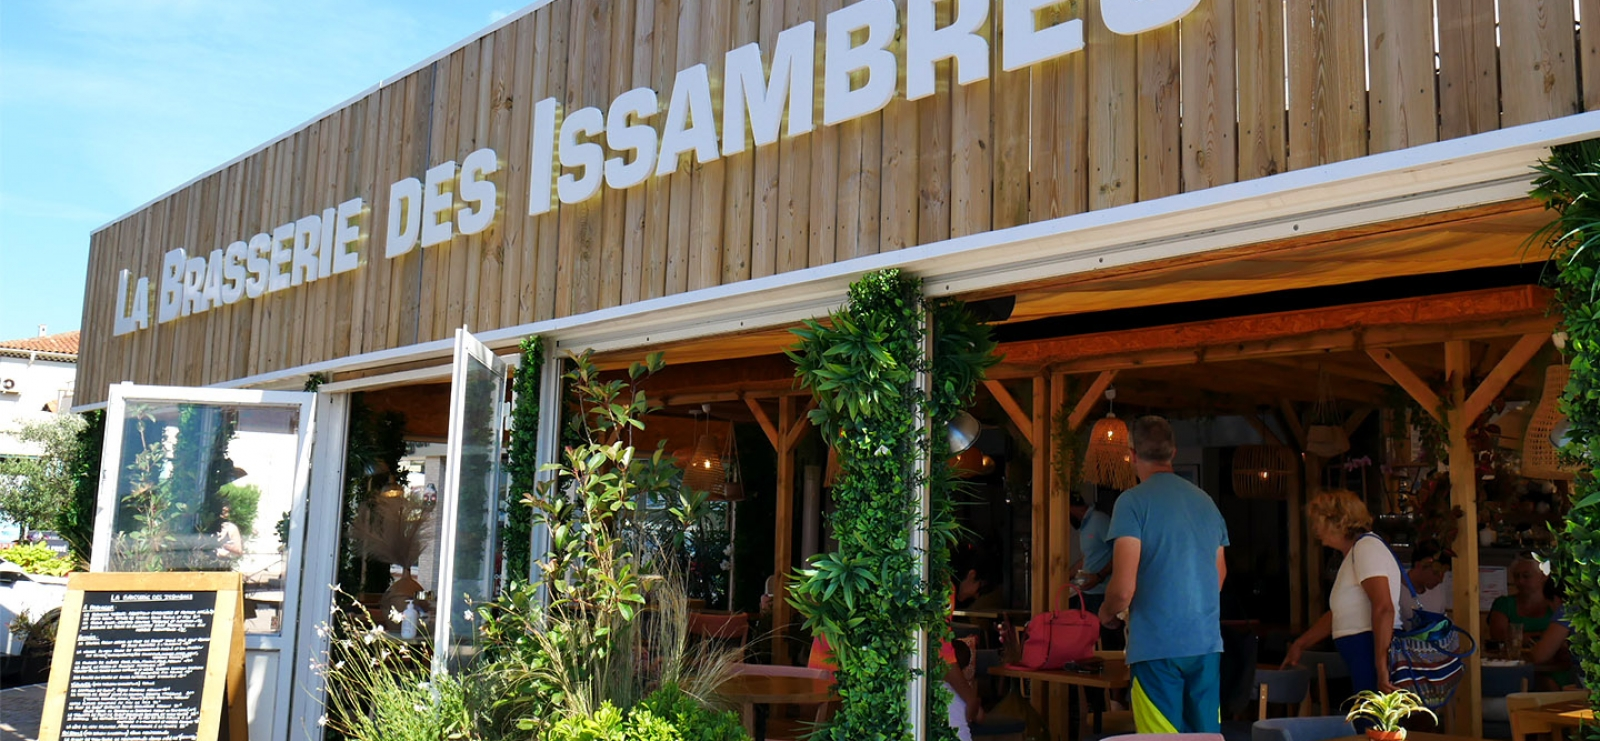 La Brasserie des Issambres